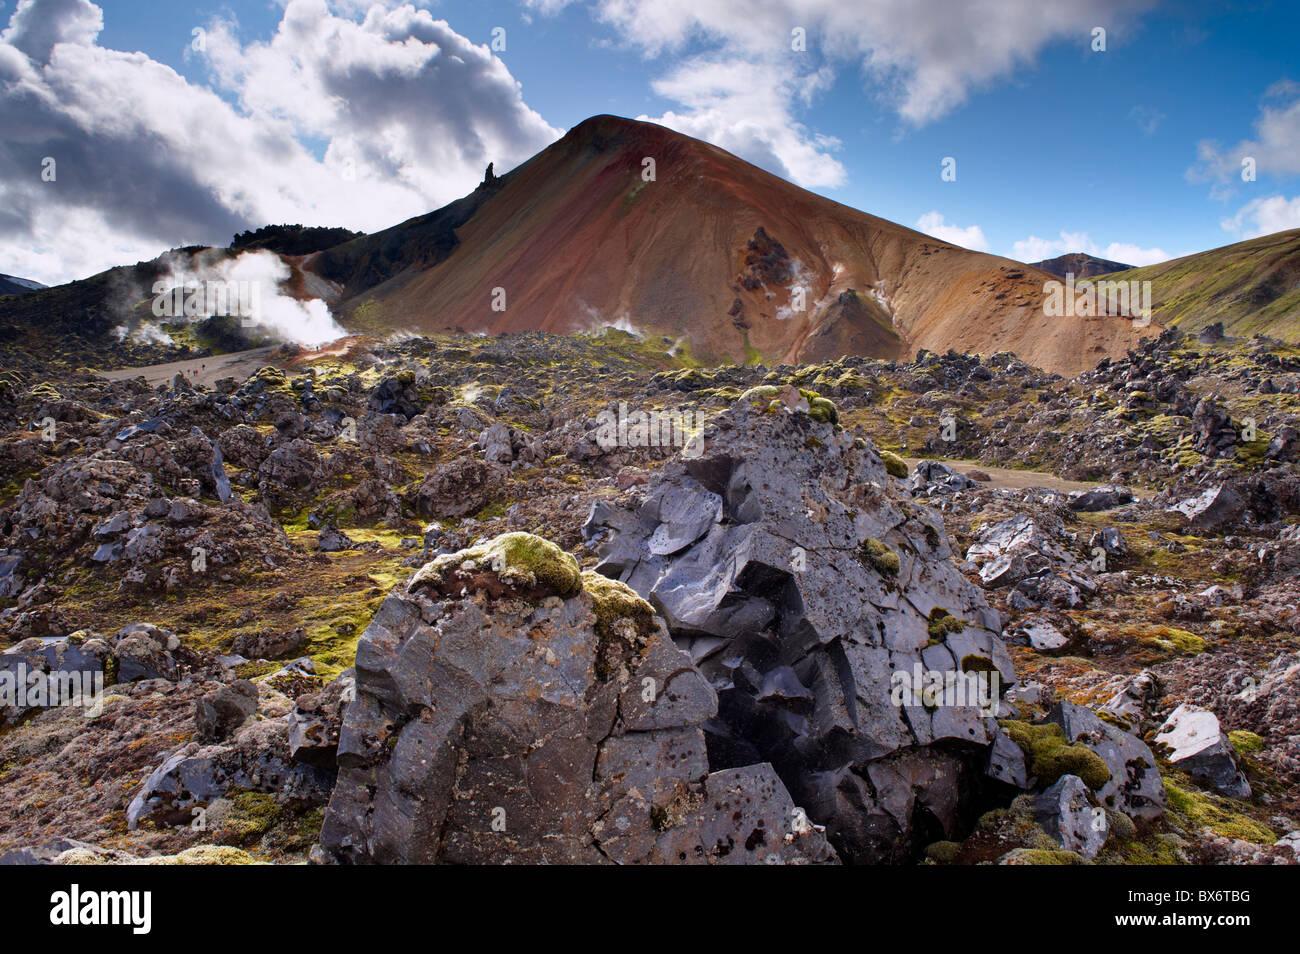 Brennisteinsalda, 855 m, Iceland's most colourful mountain, dominates the lava fields of Laugahraun, Iceland - Stock Image